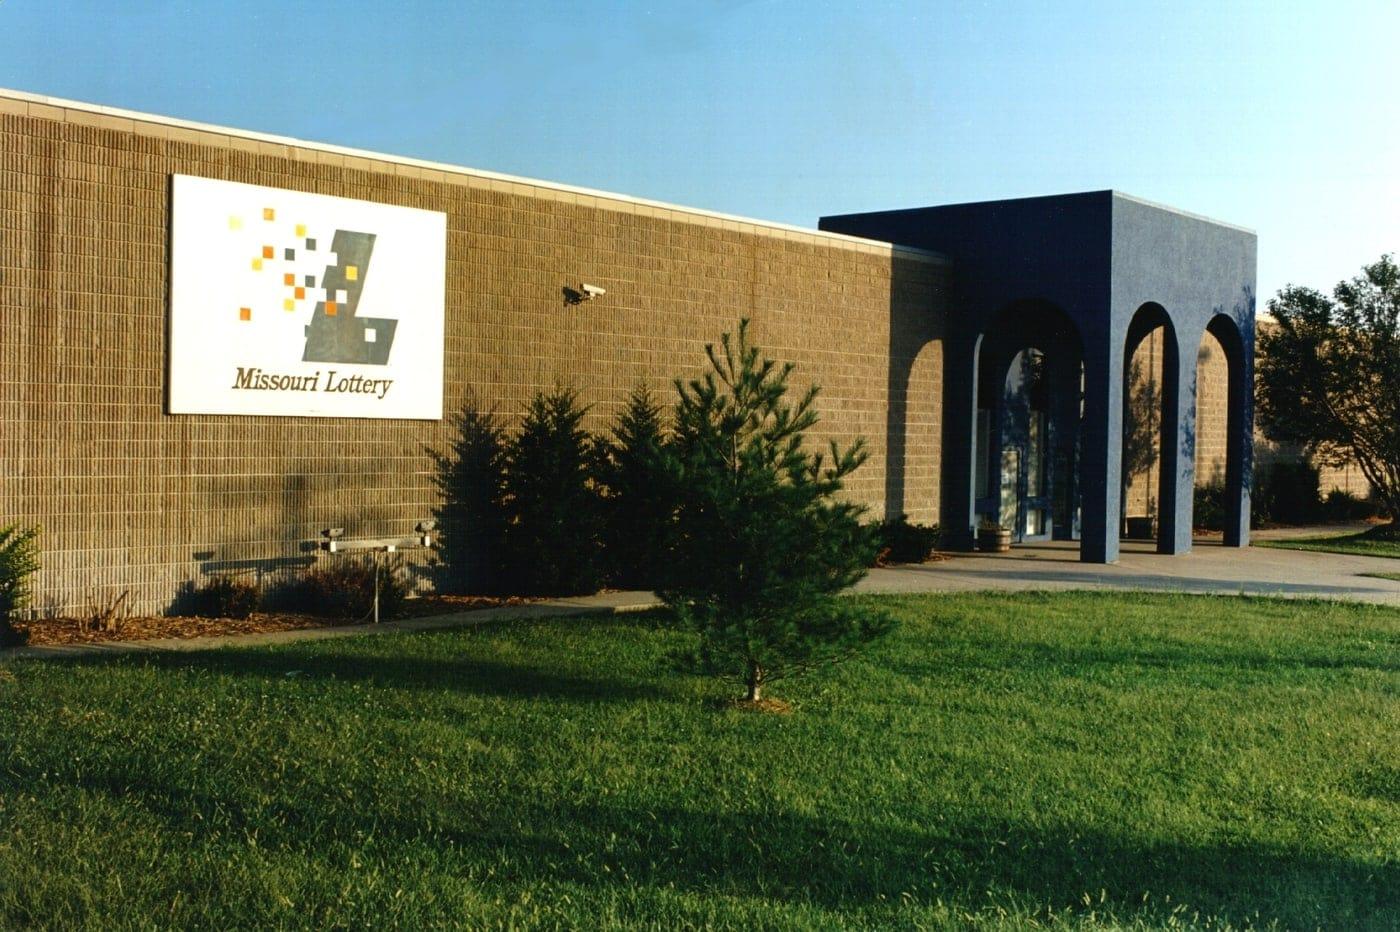 Missouri Lottery Commission